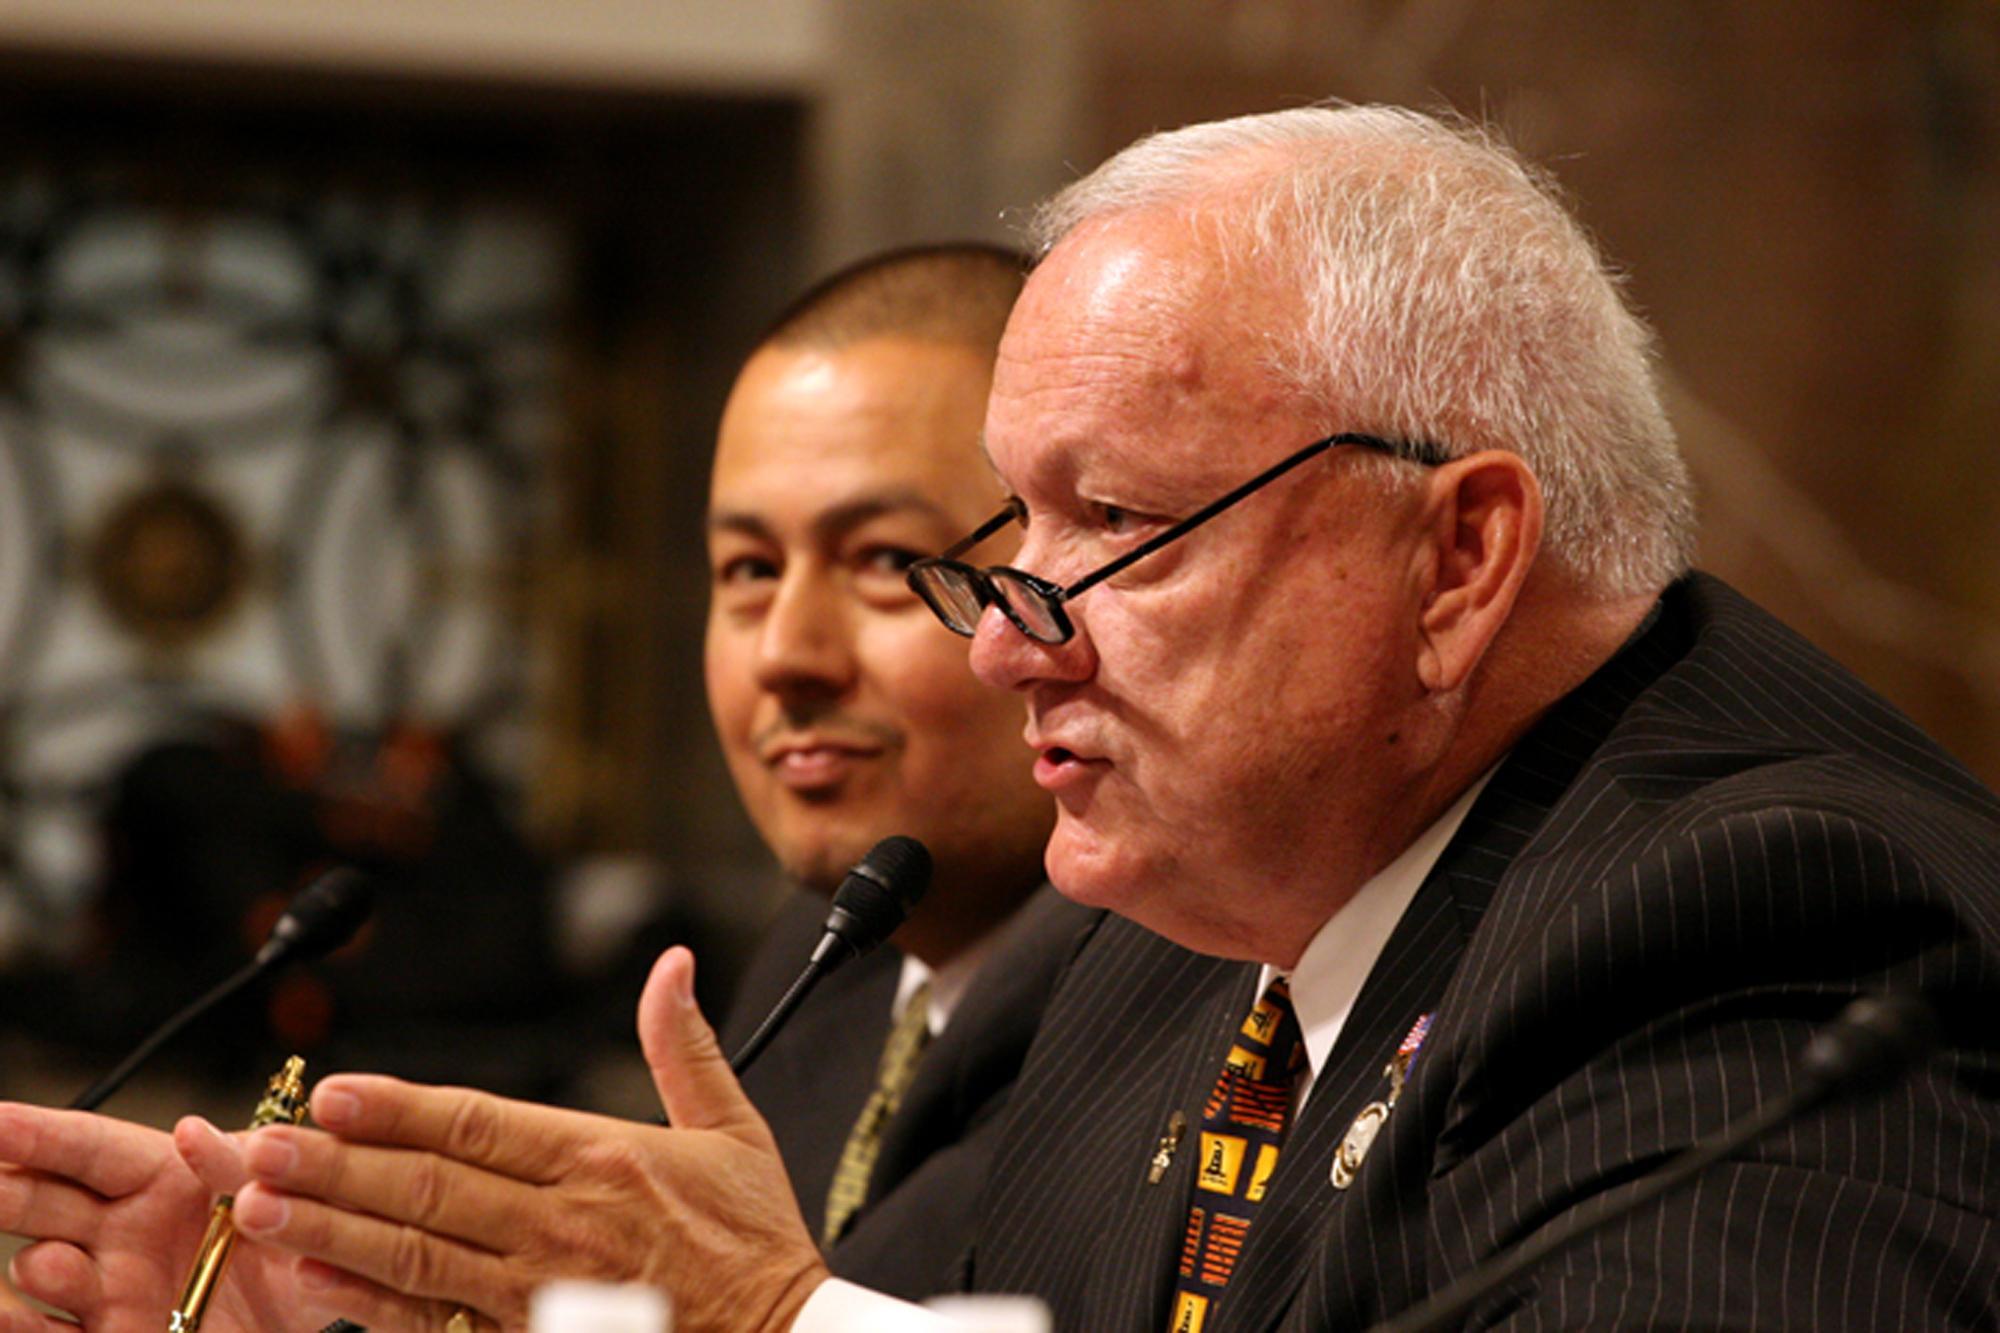 Former state Sen. Russell Pearce, R-Mesa, testifies about his bill, Arizona's SB 1070 immigration law, before a U.S. Senate subcommittee Wednesday as Sen. Steve Gallardo, D-Phoenix, listens.